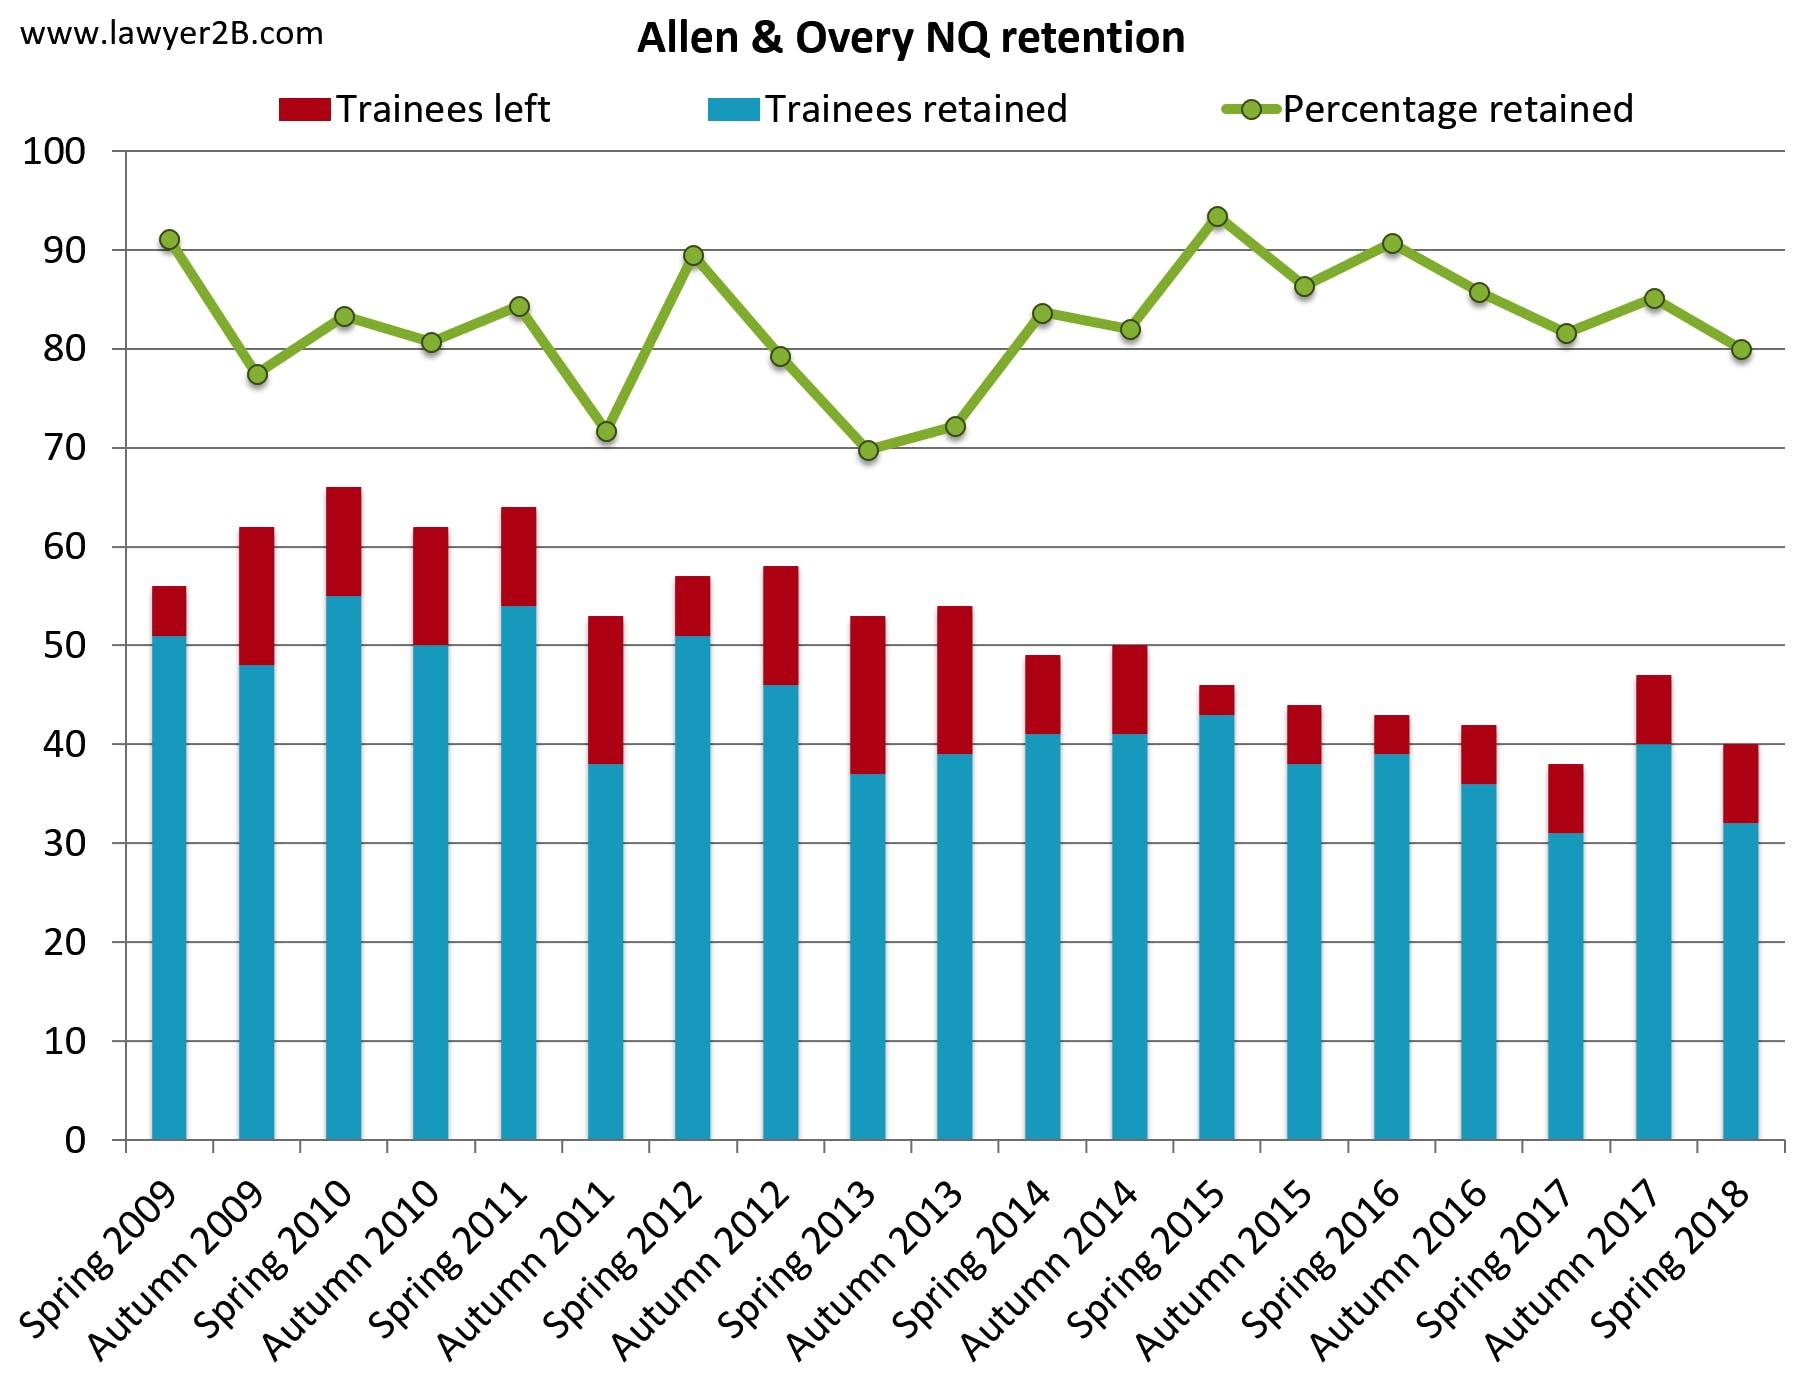 Allen & Overy retention